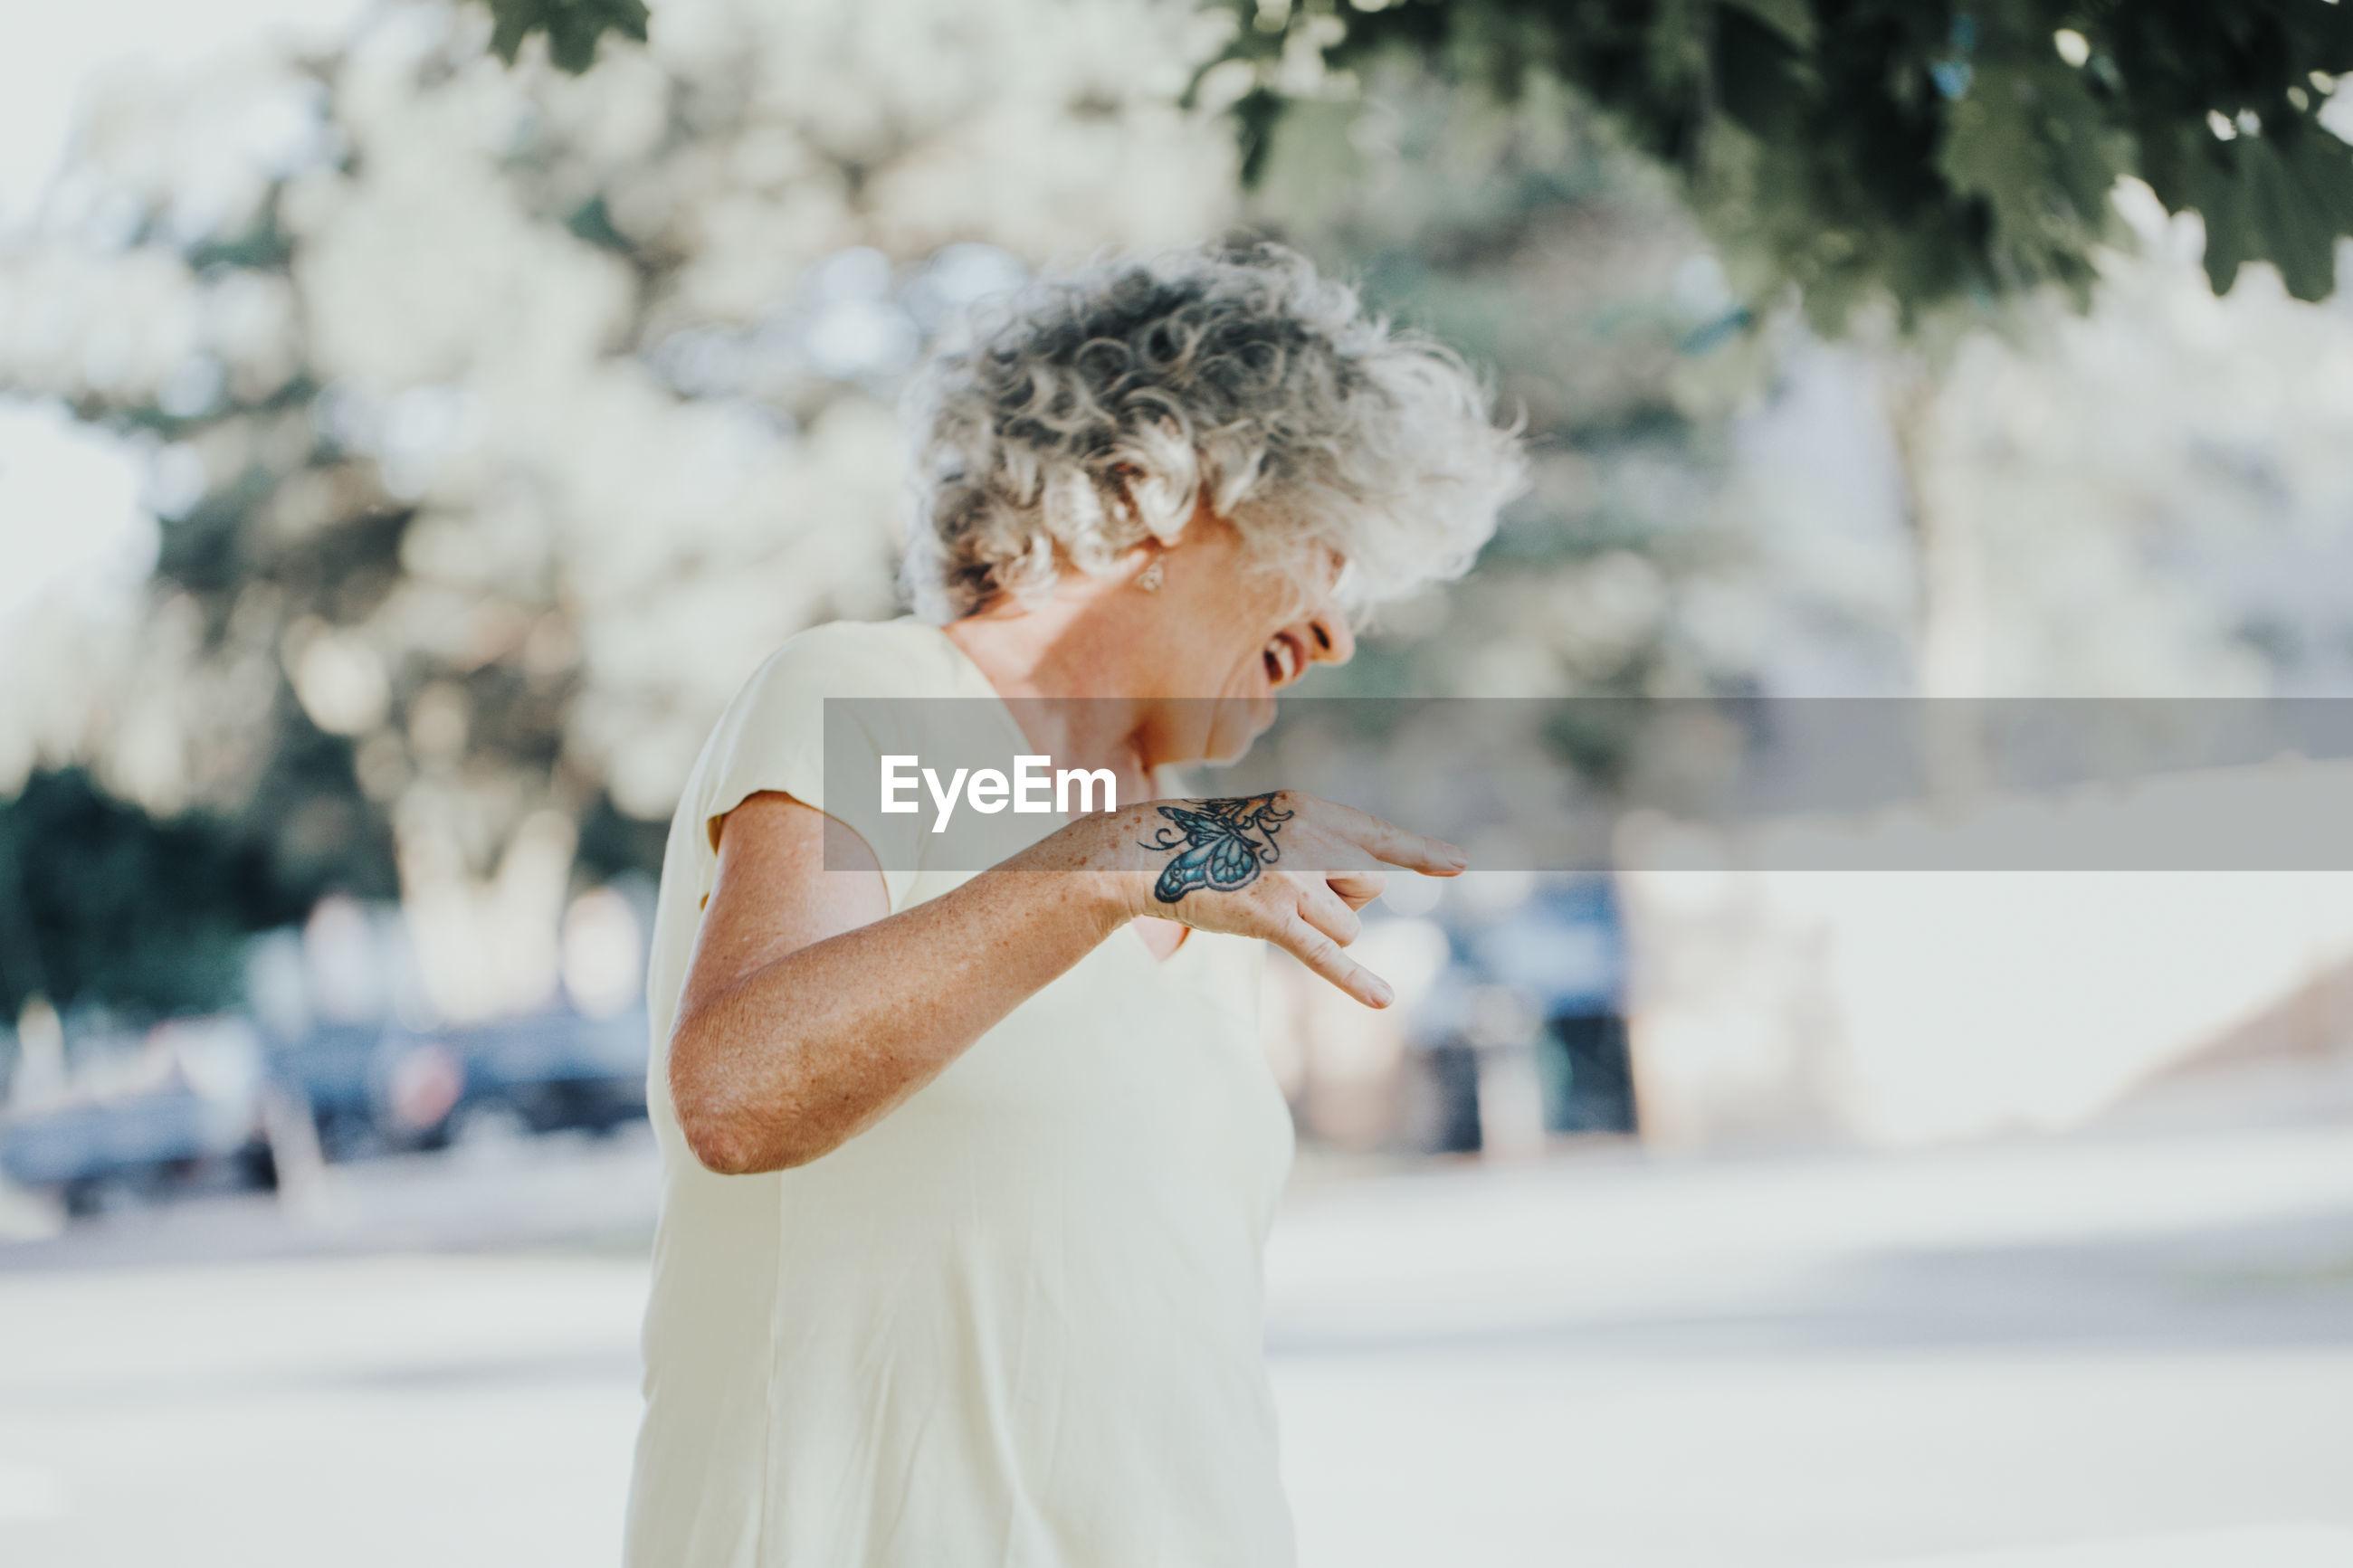 Senior woman standing outdoors